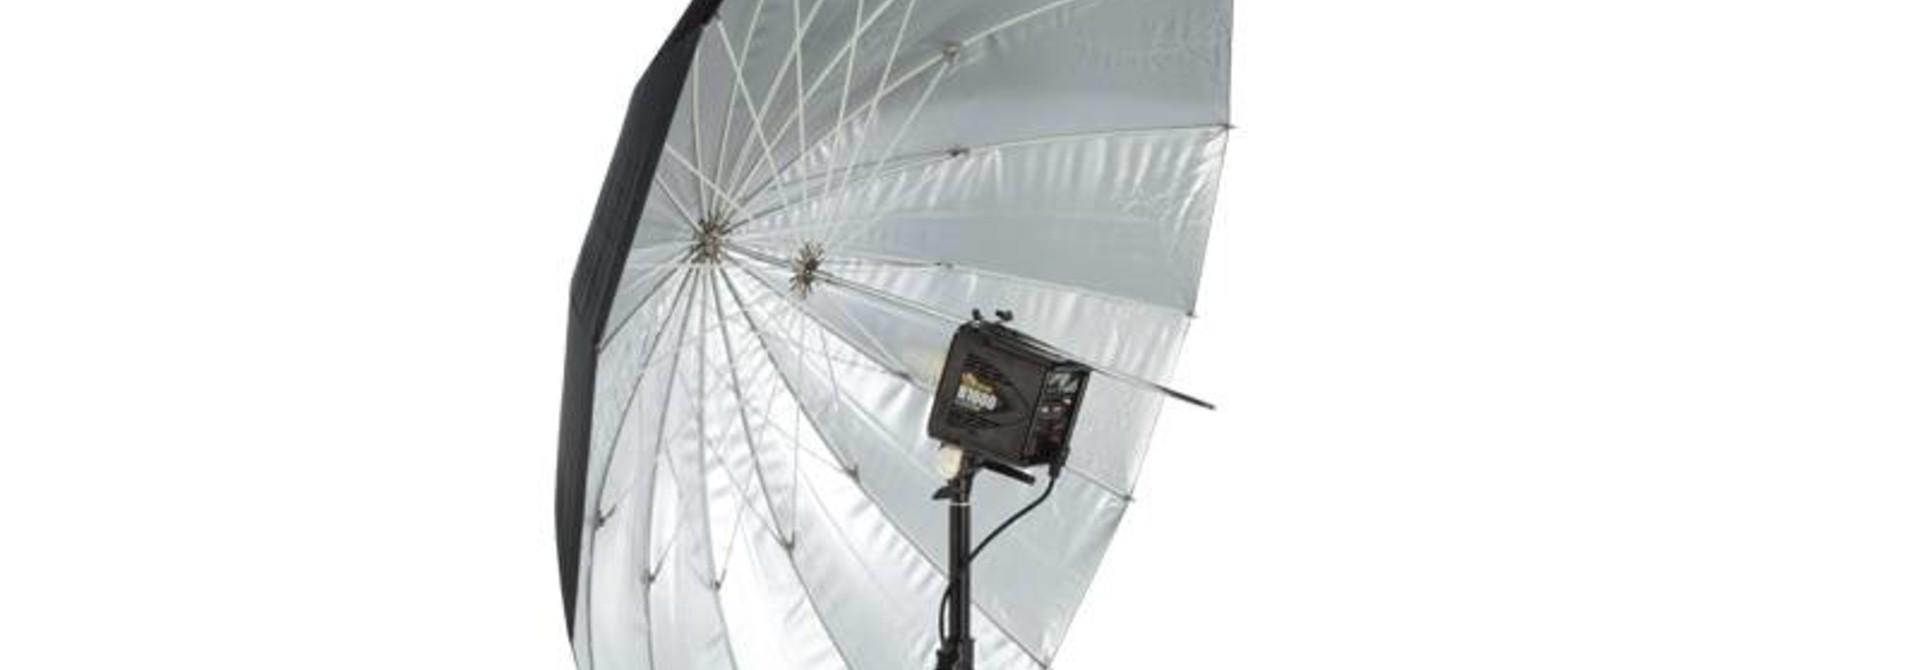 "64"" Soft Silver PLM Umbrella"